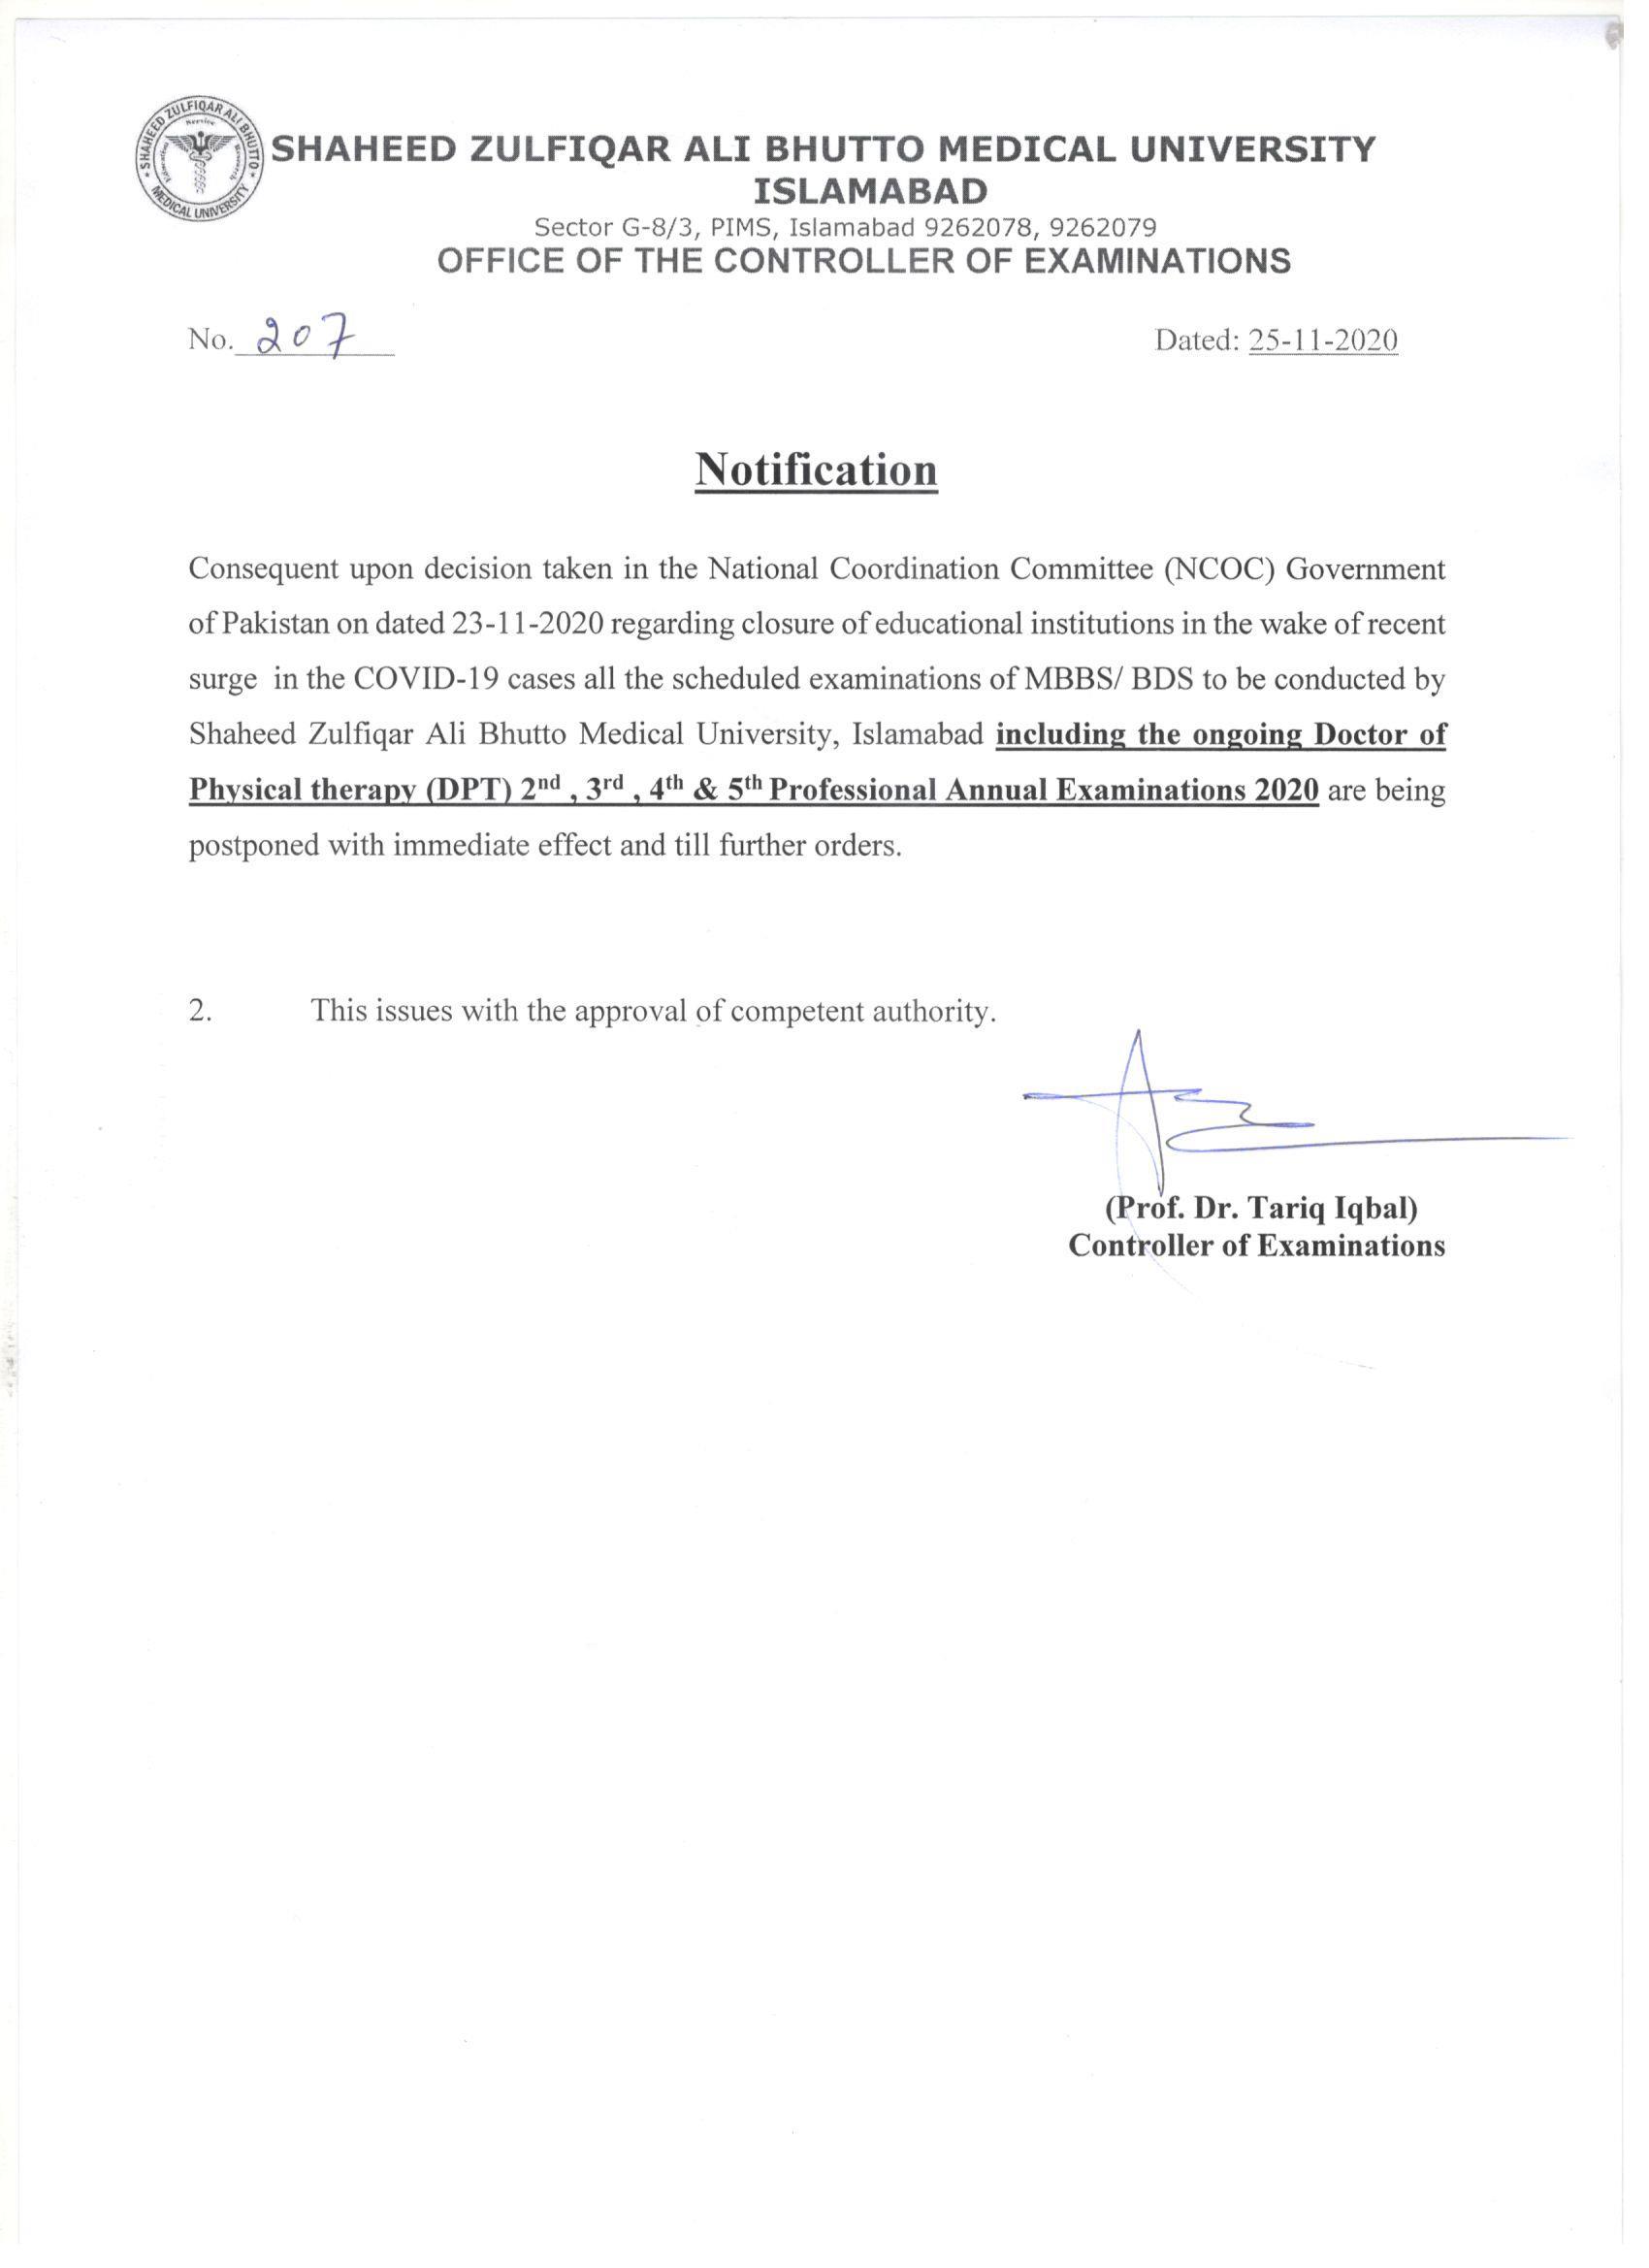 Notification for Postponement of Exam